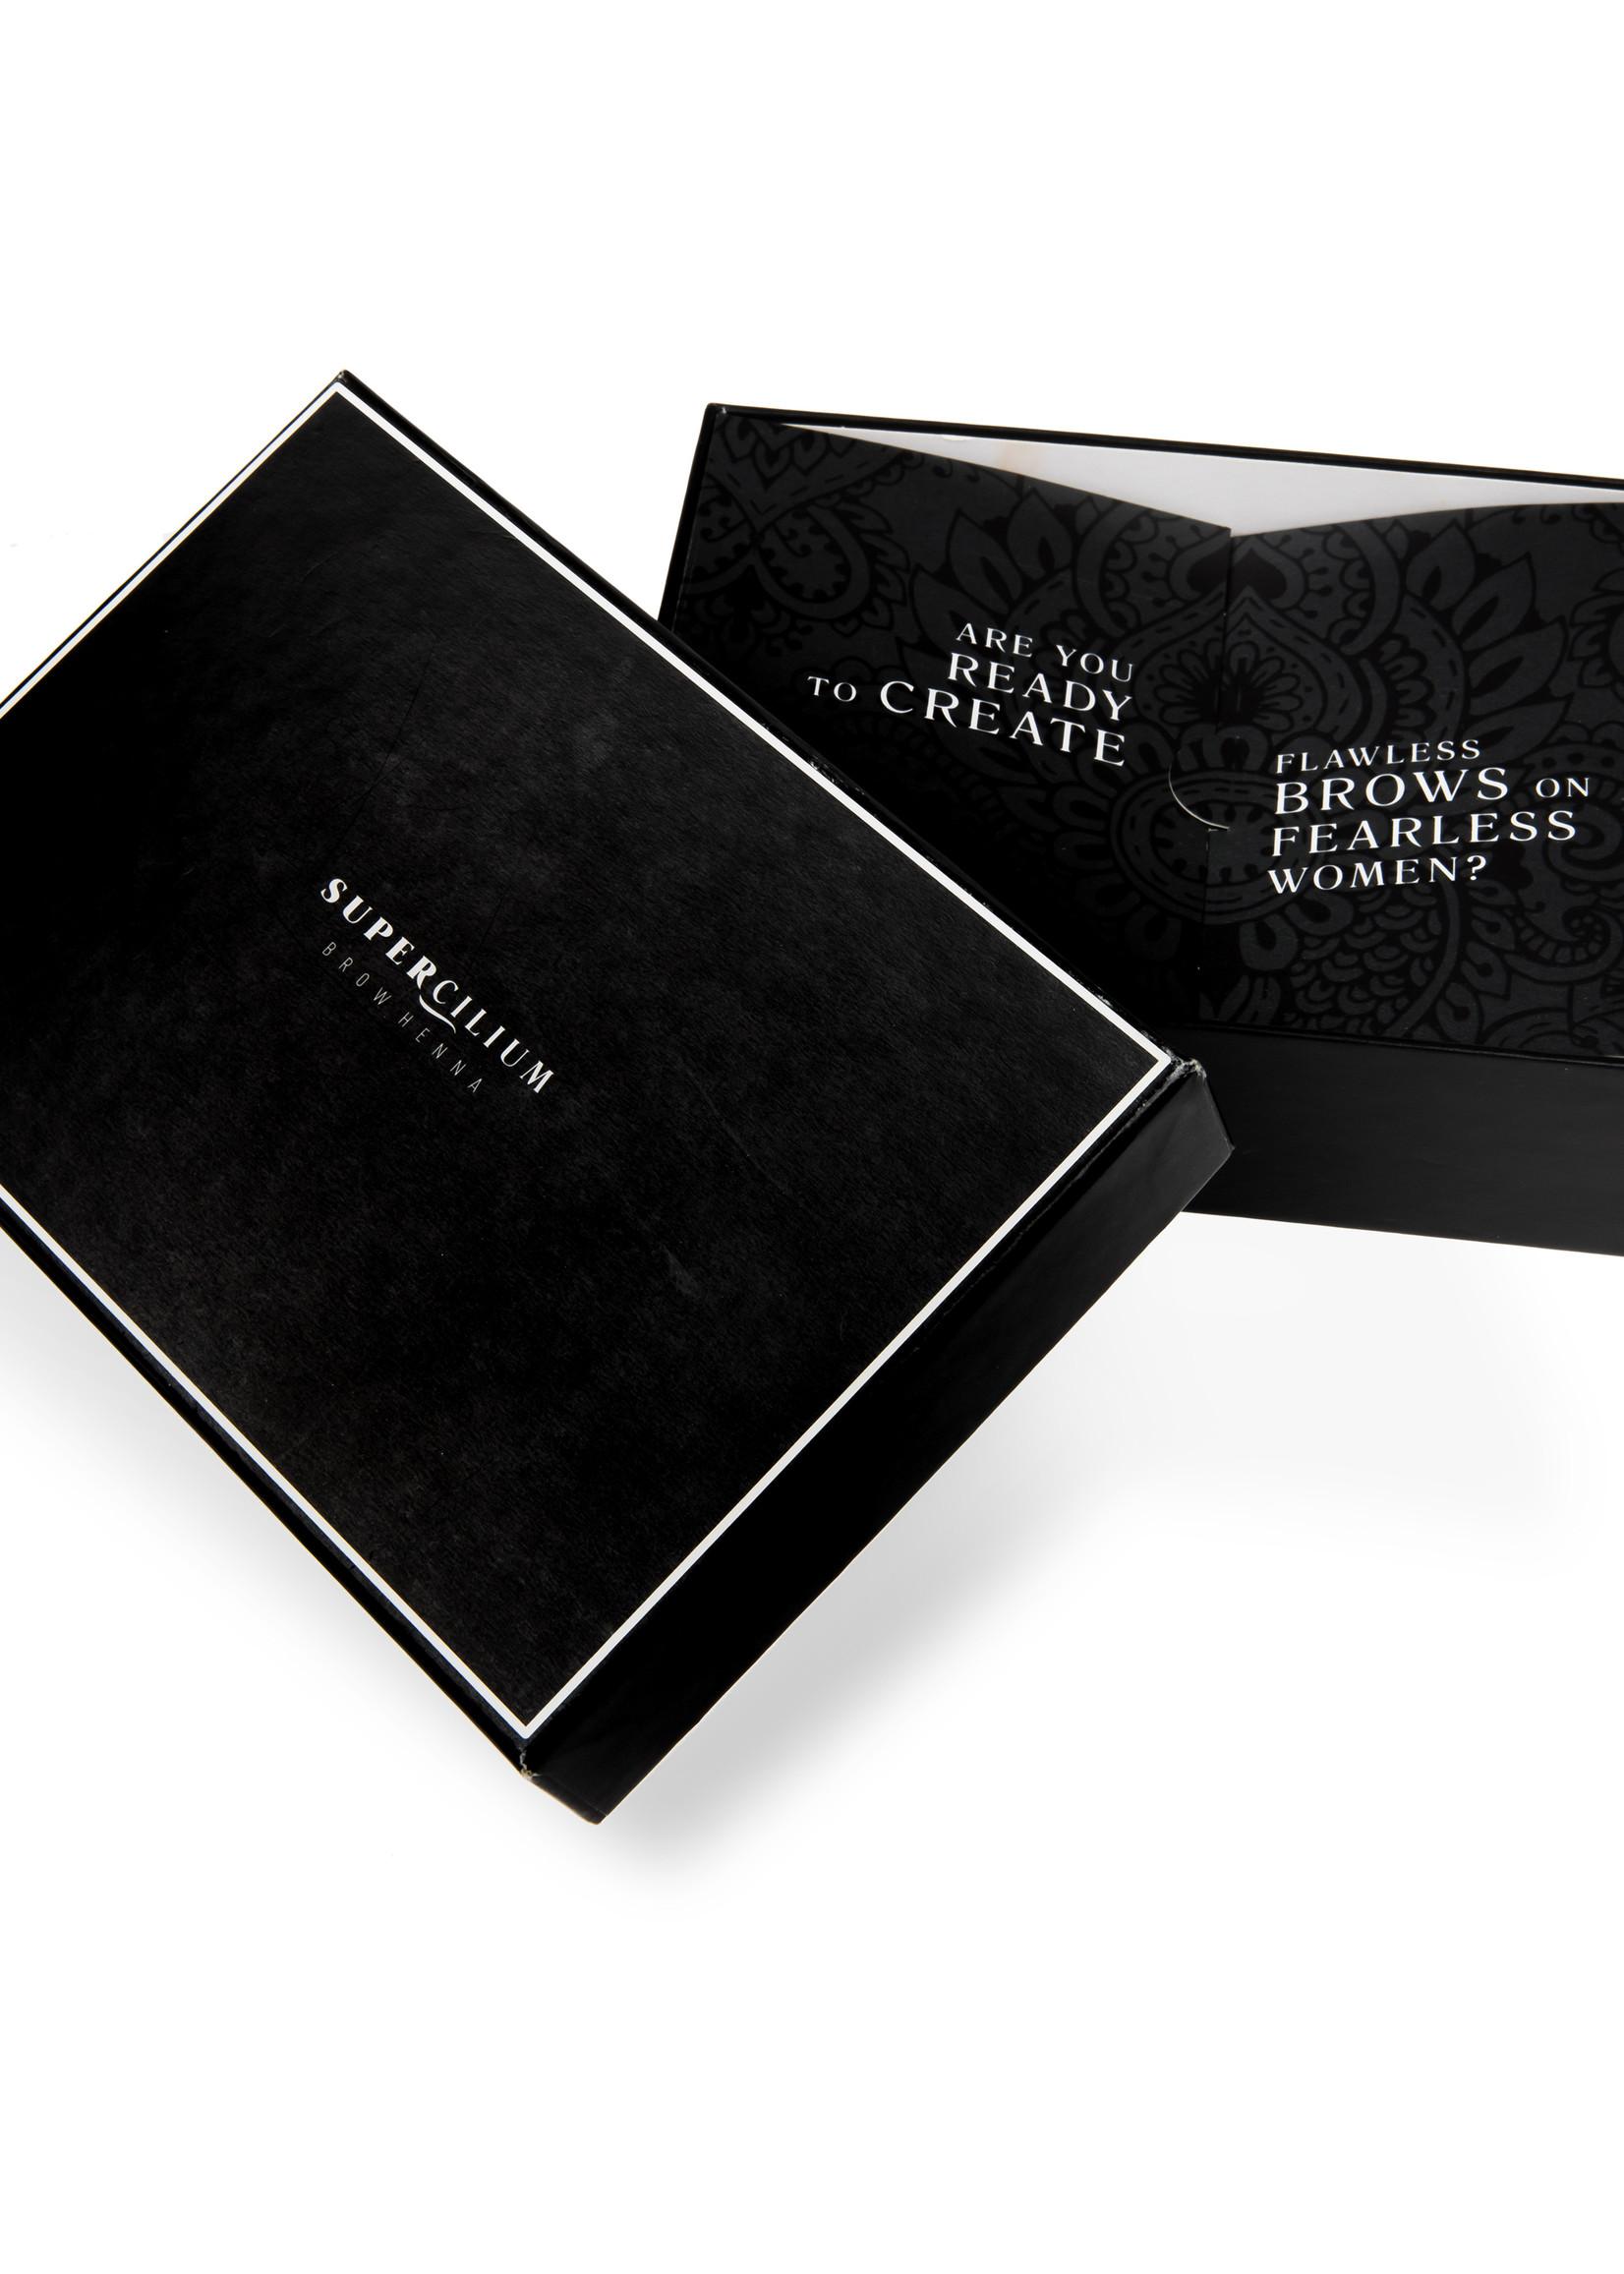 Supercilium Brow Henna Starter Kit